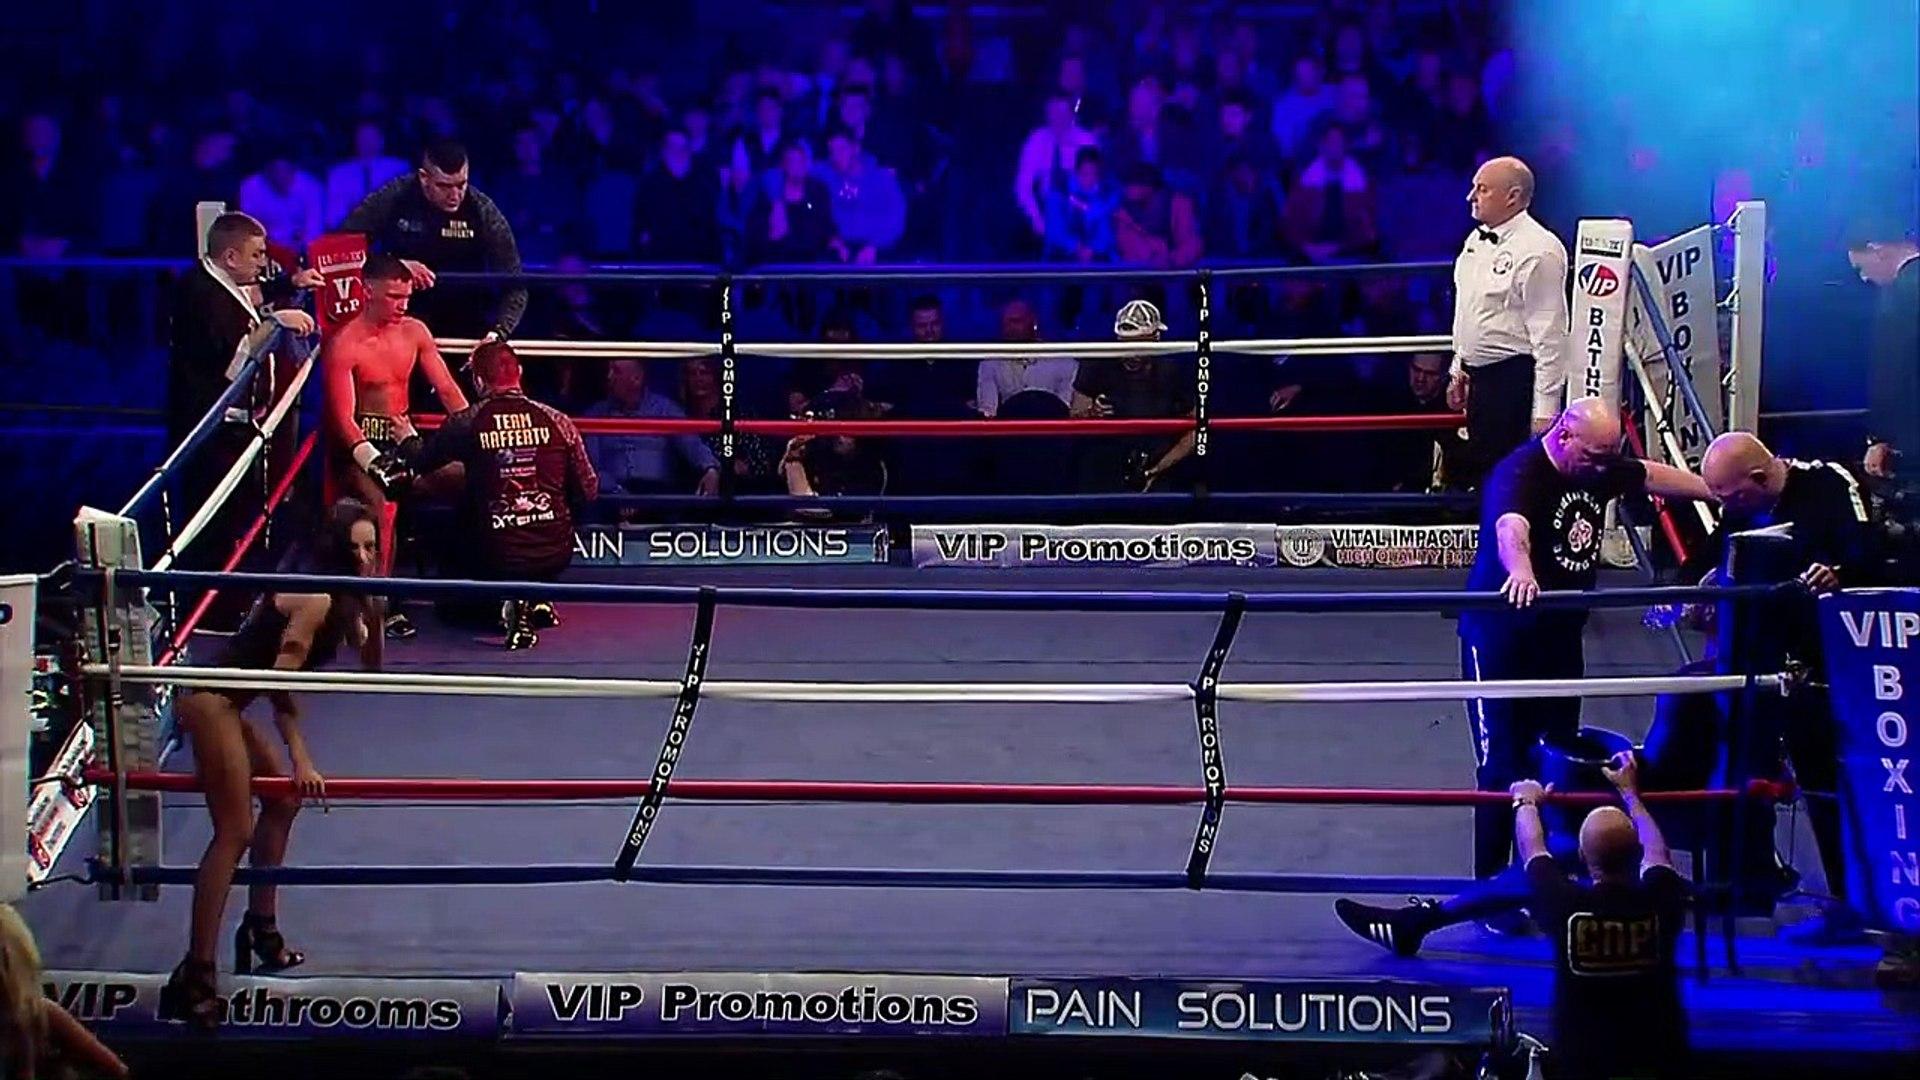 Jack Rafferty vs Richard Samuels (09-03-2019) Full Fight 720 x 1280